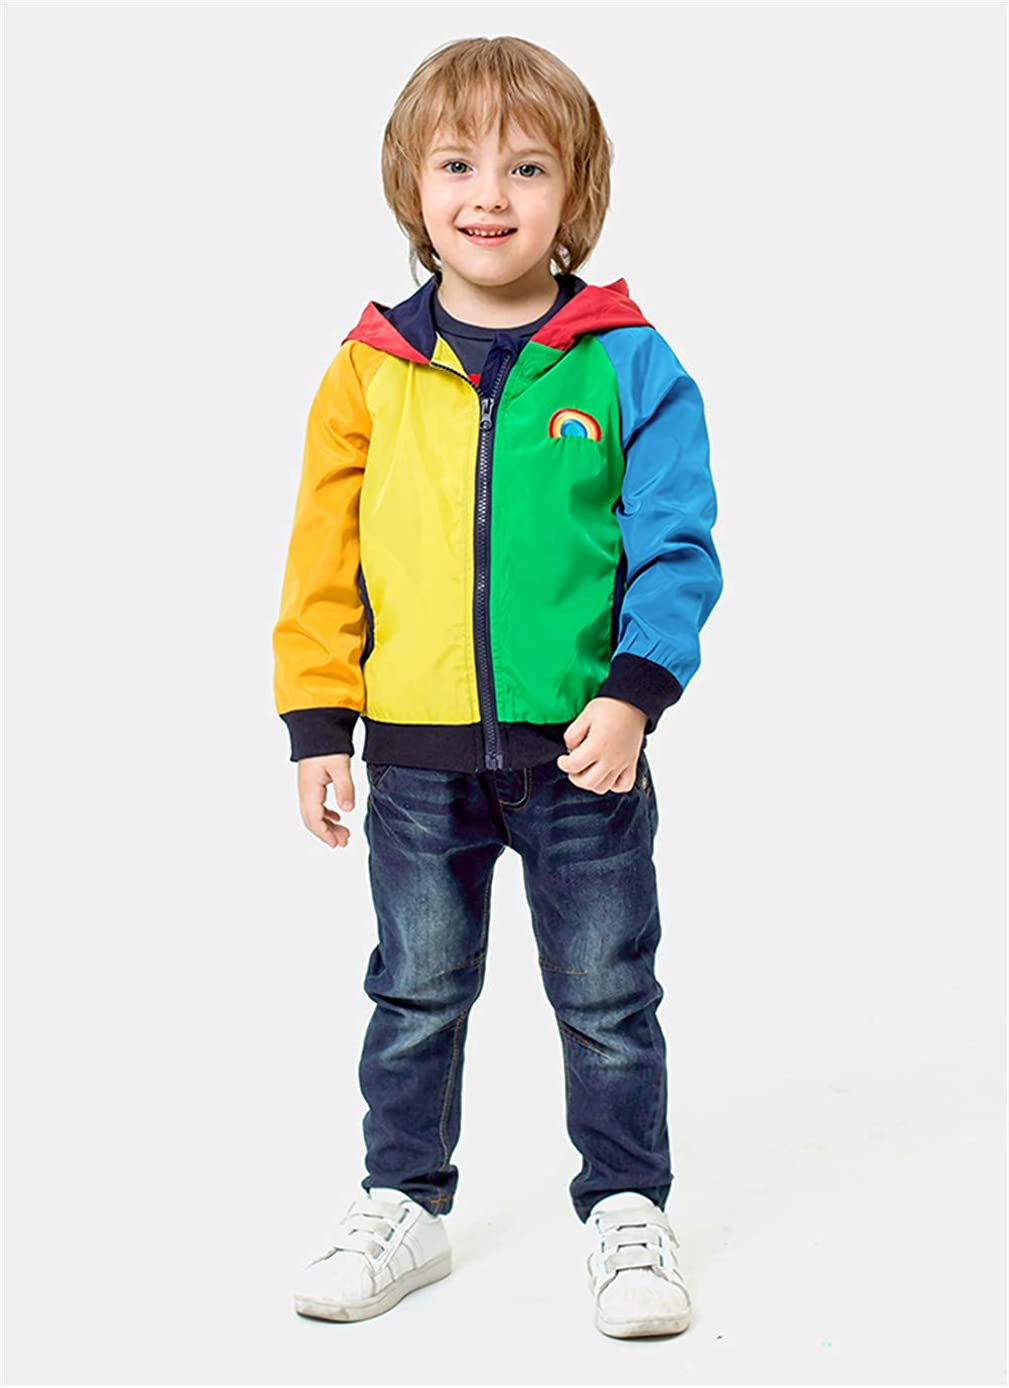 Mud Kingdom Boy Zip Up Hoodie Sweatshirt with Hood Rainbow Patchwork